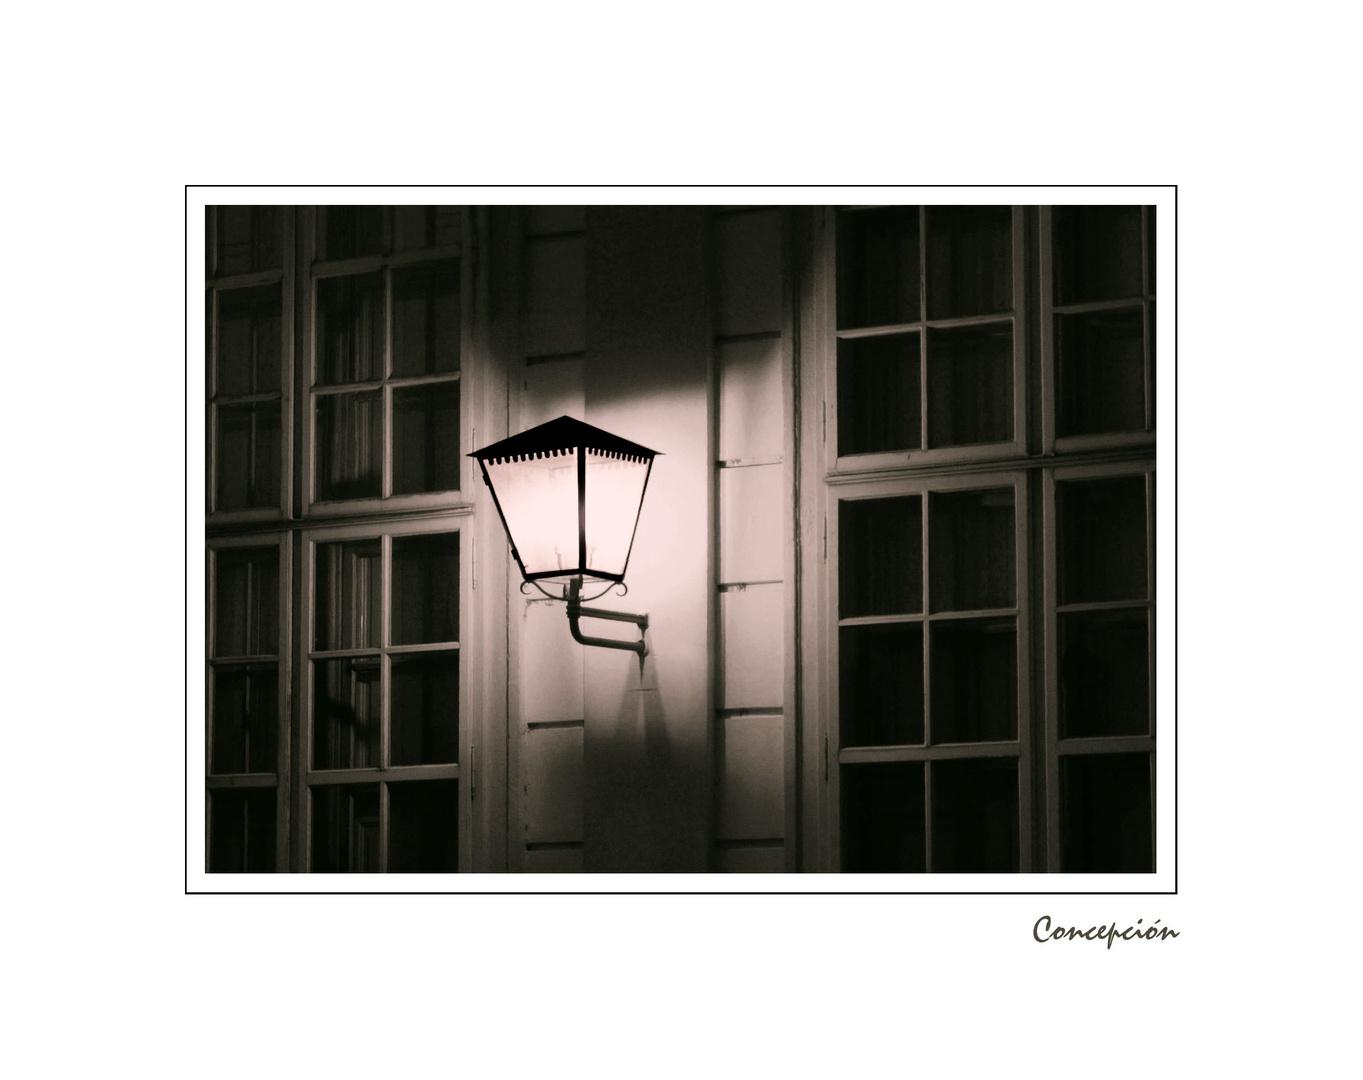 La luz del farol